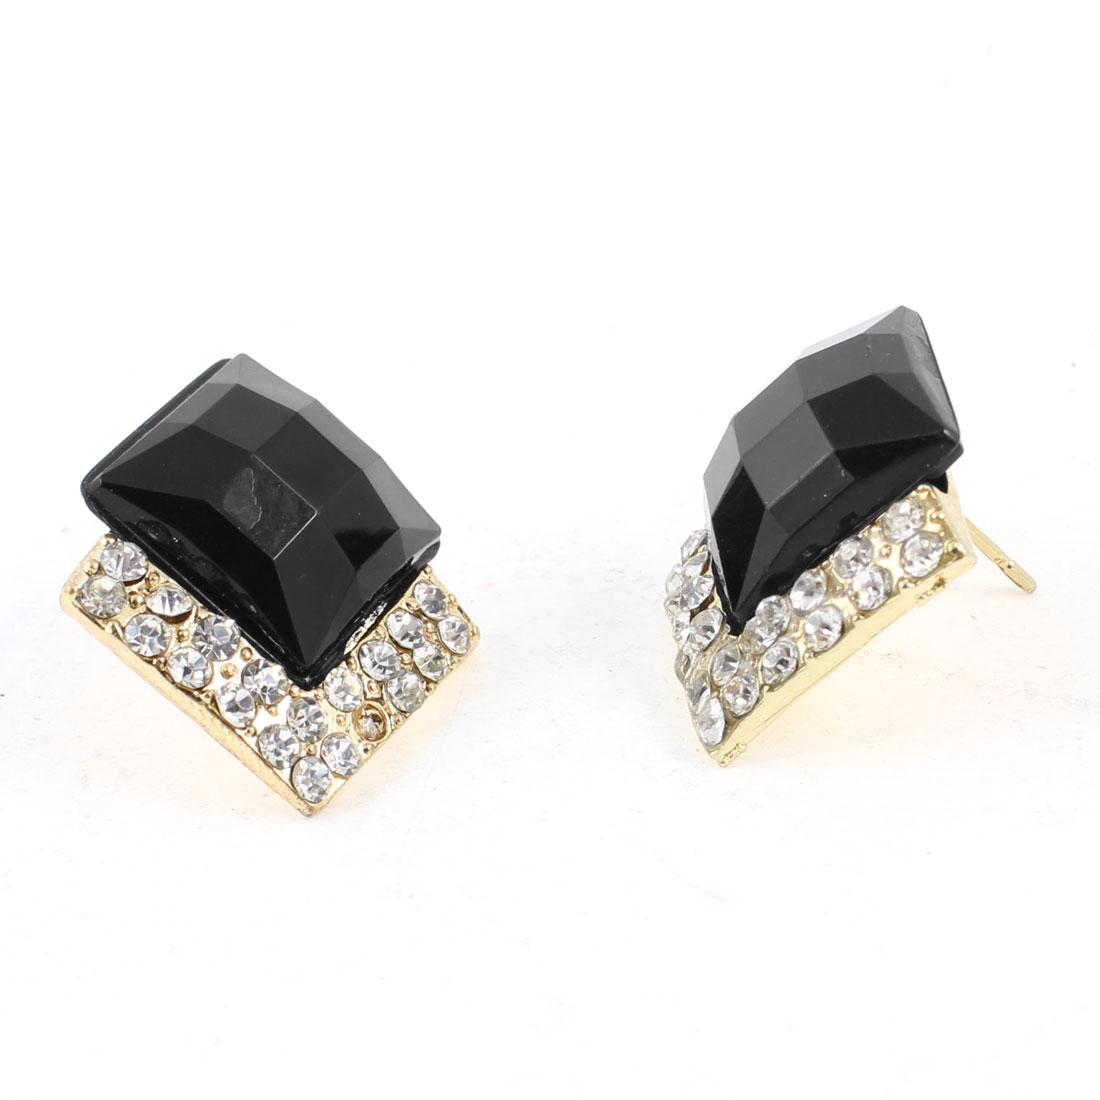 Woman Rhinestone Inlaid Black Square Bead Ornament Ear Nail Stud Earrings Pair